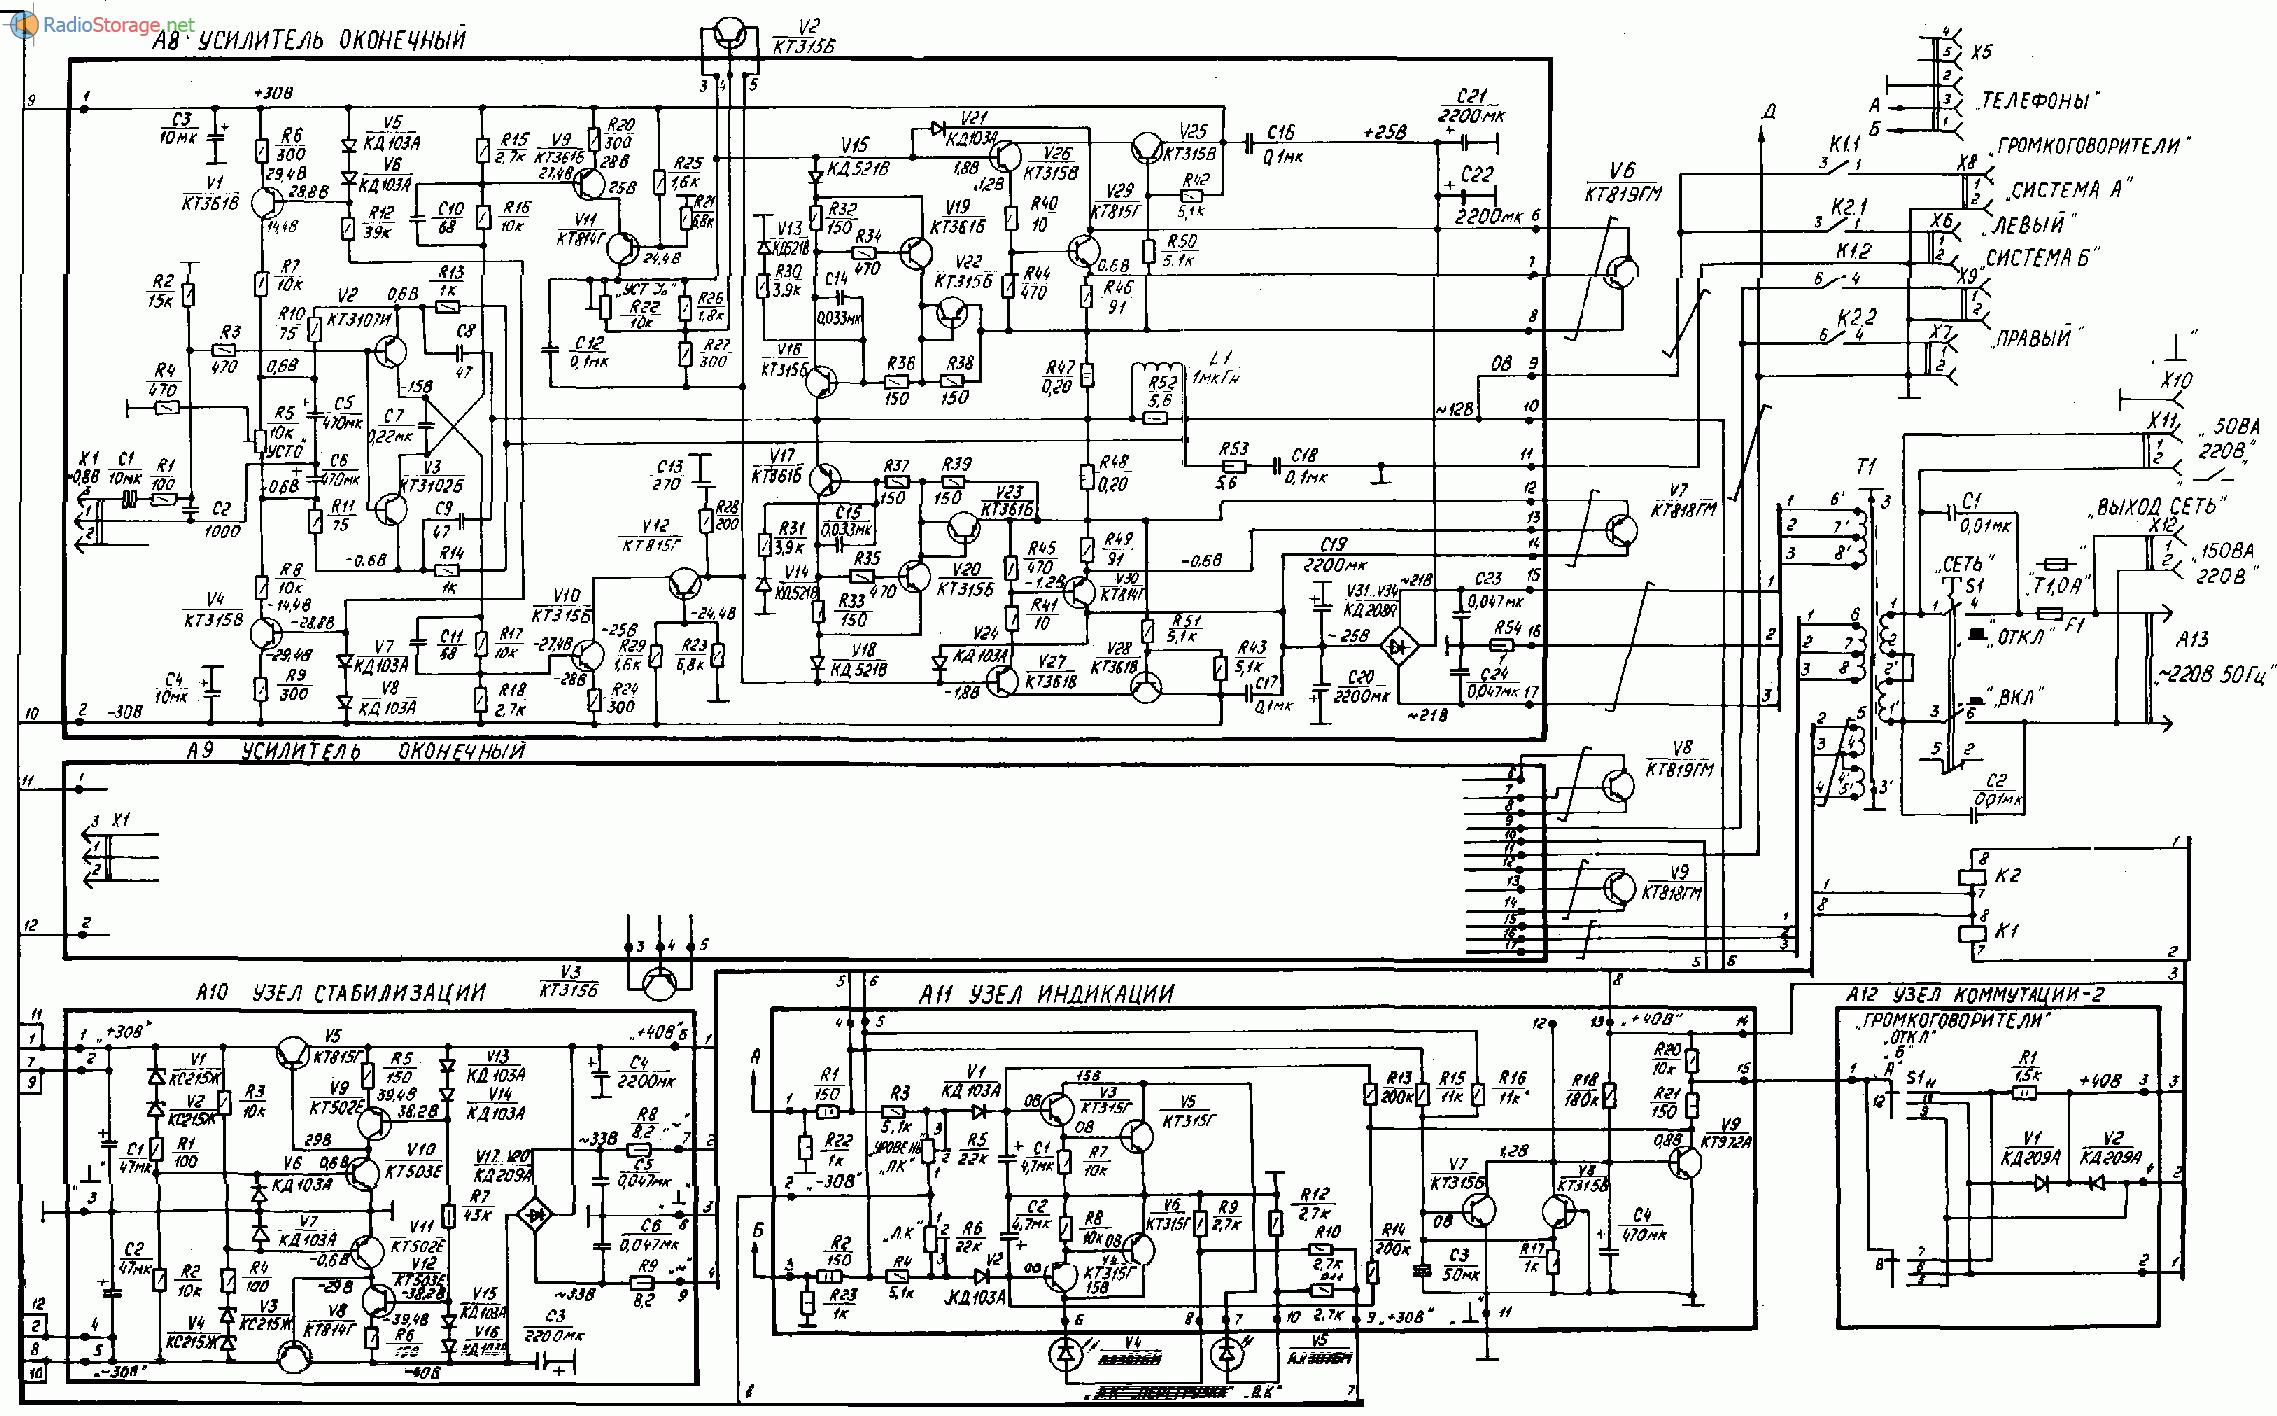 Схема усилителя бриг 001 стерео фото 861